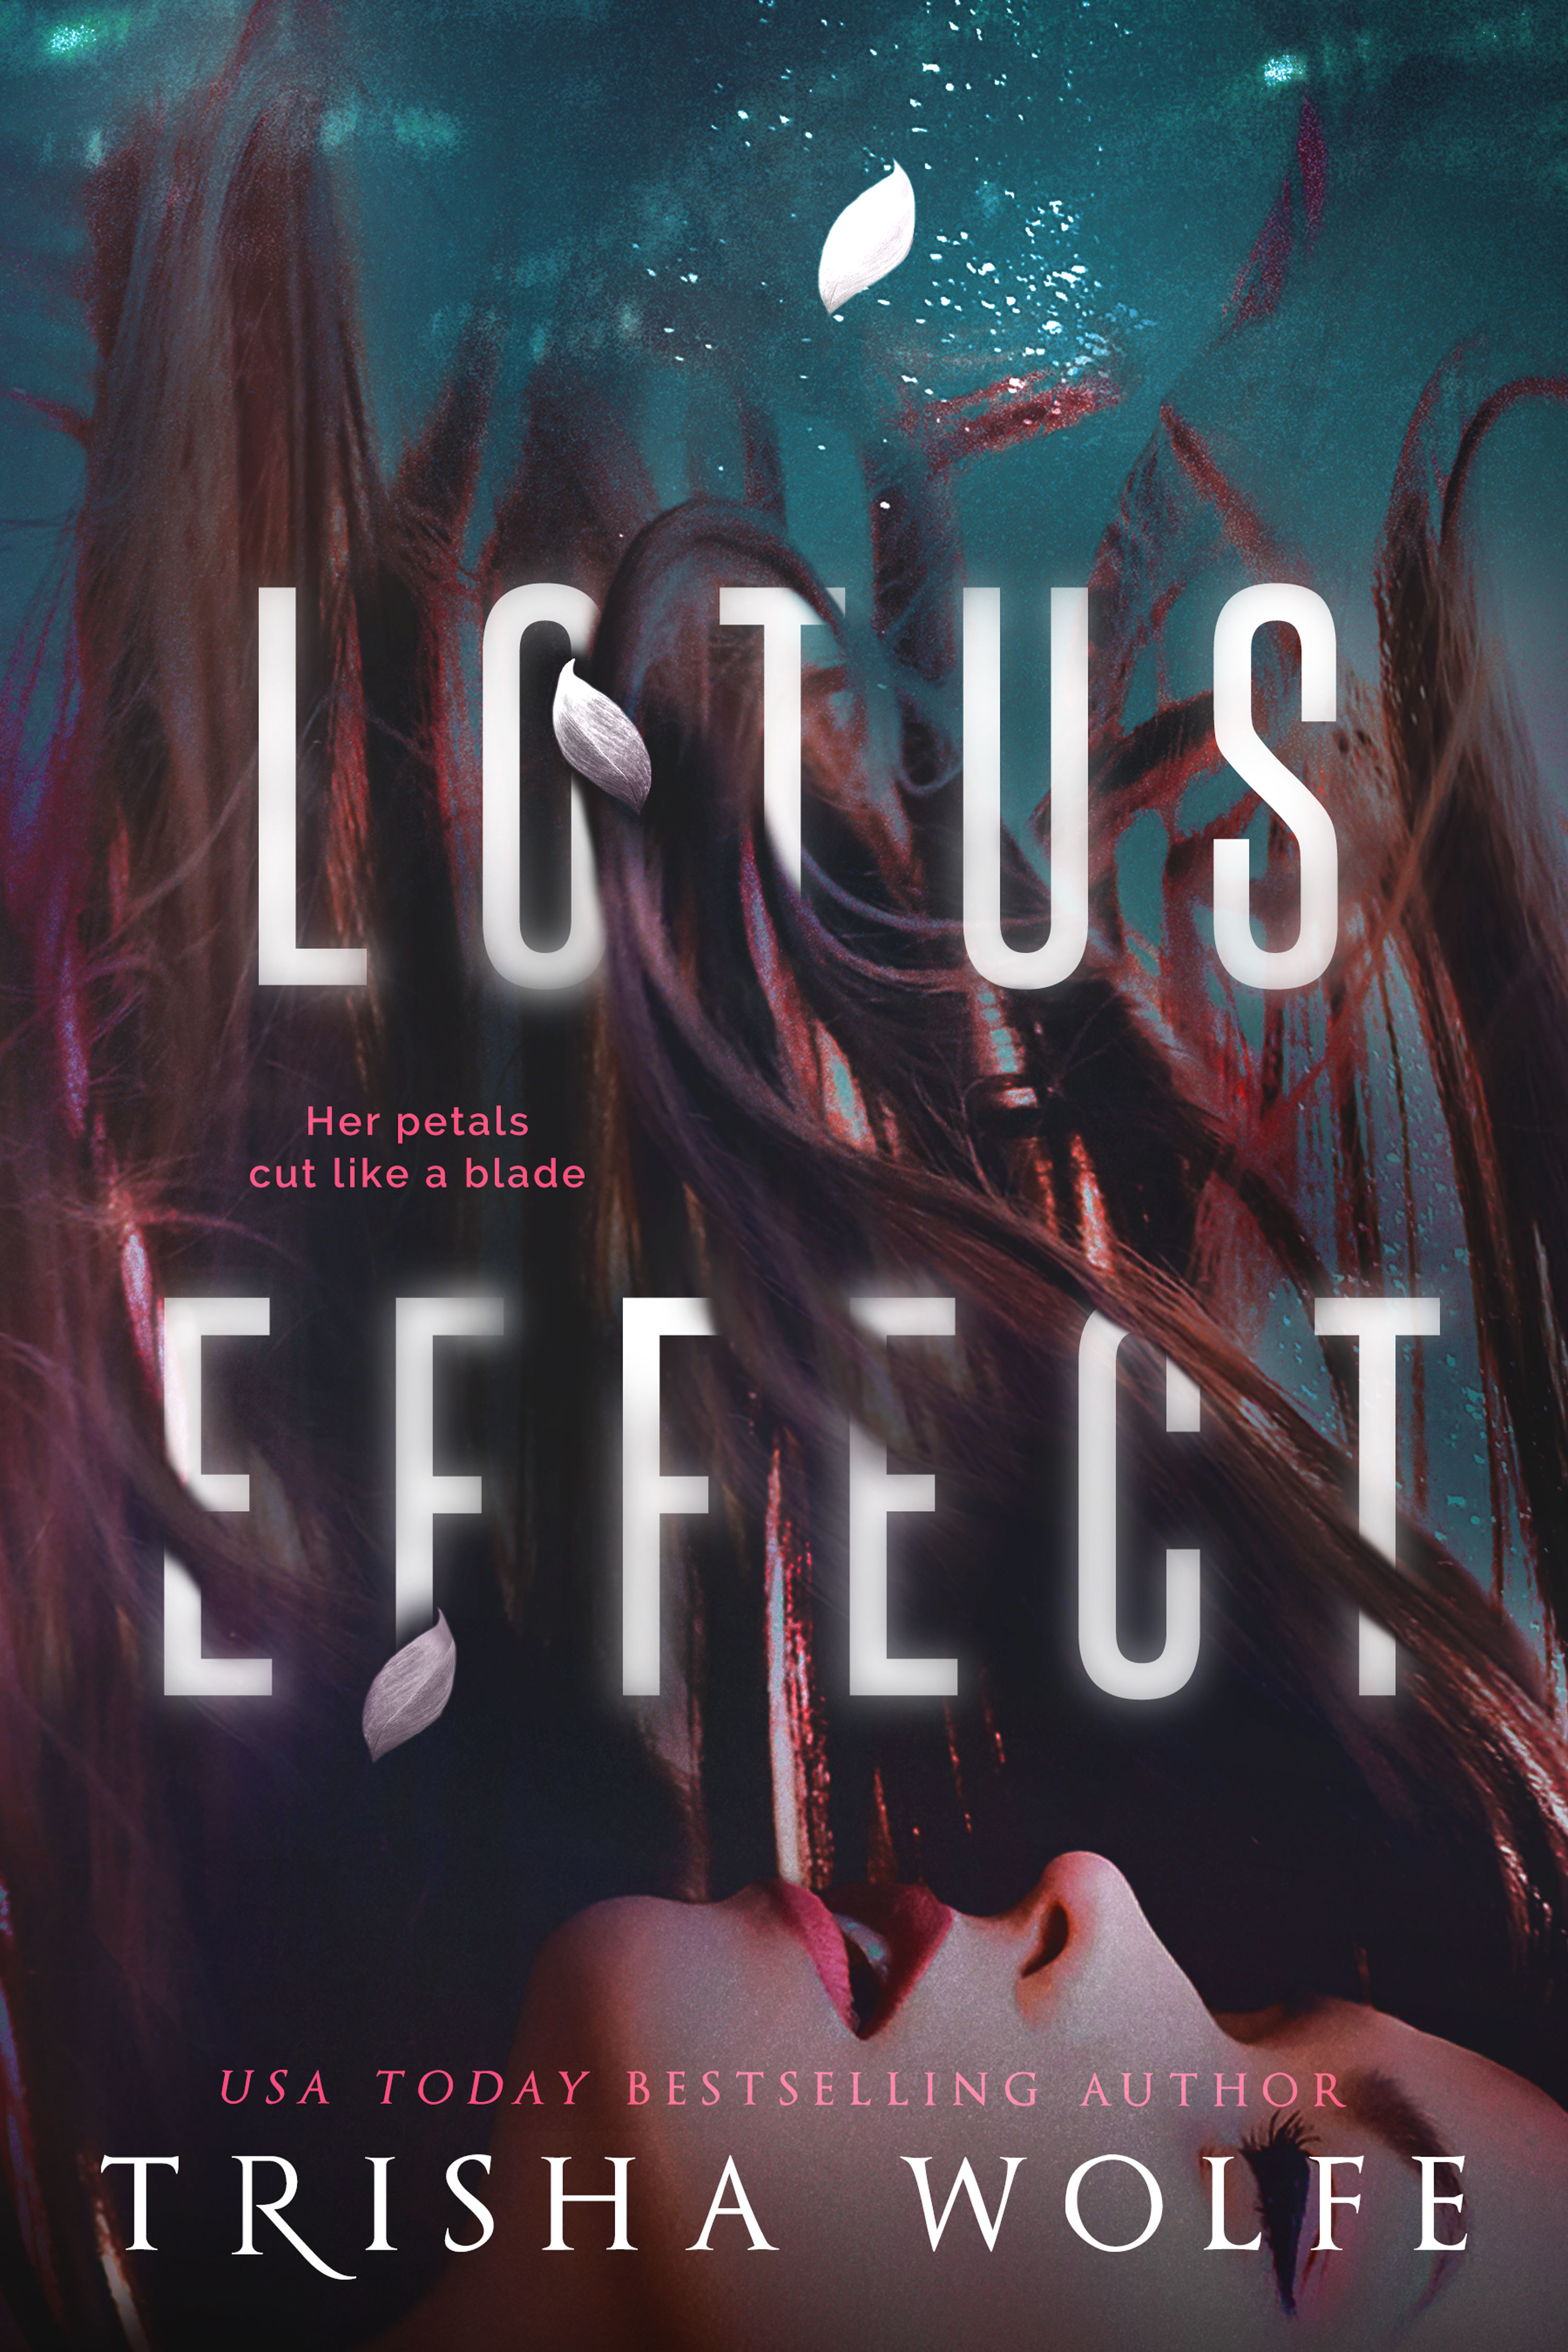 Lotus Effect by Trisha Wolfe